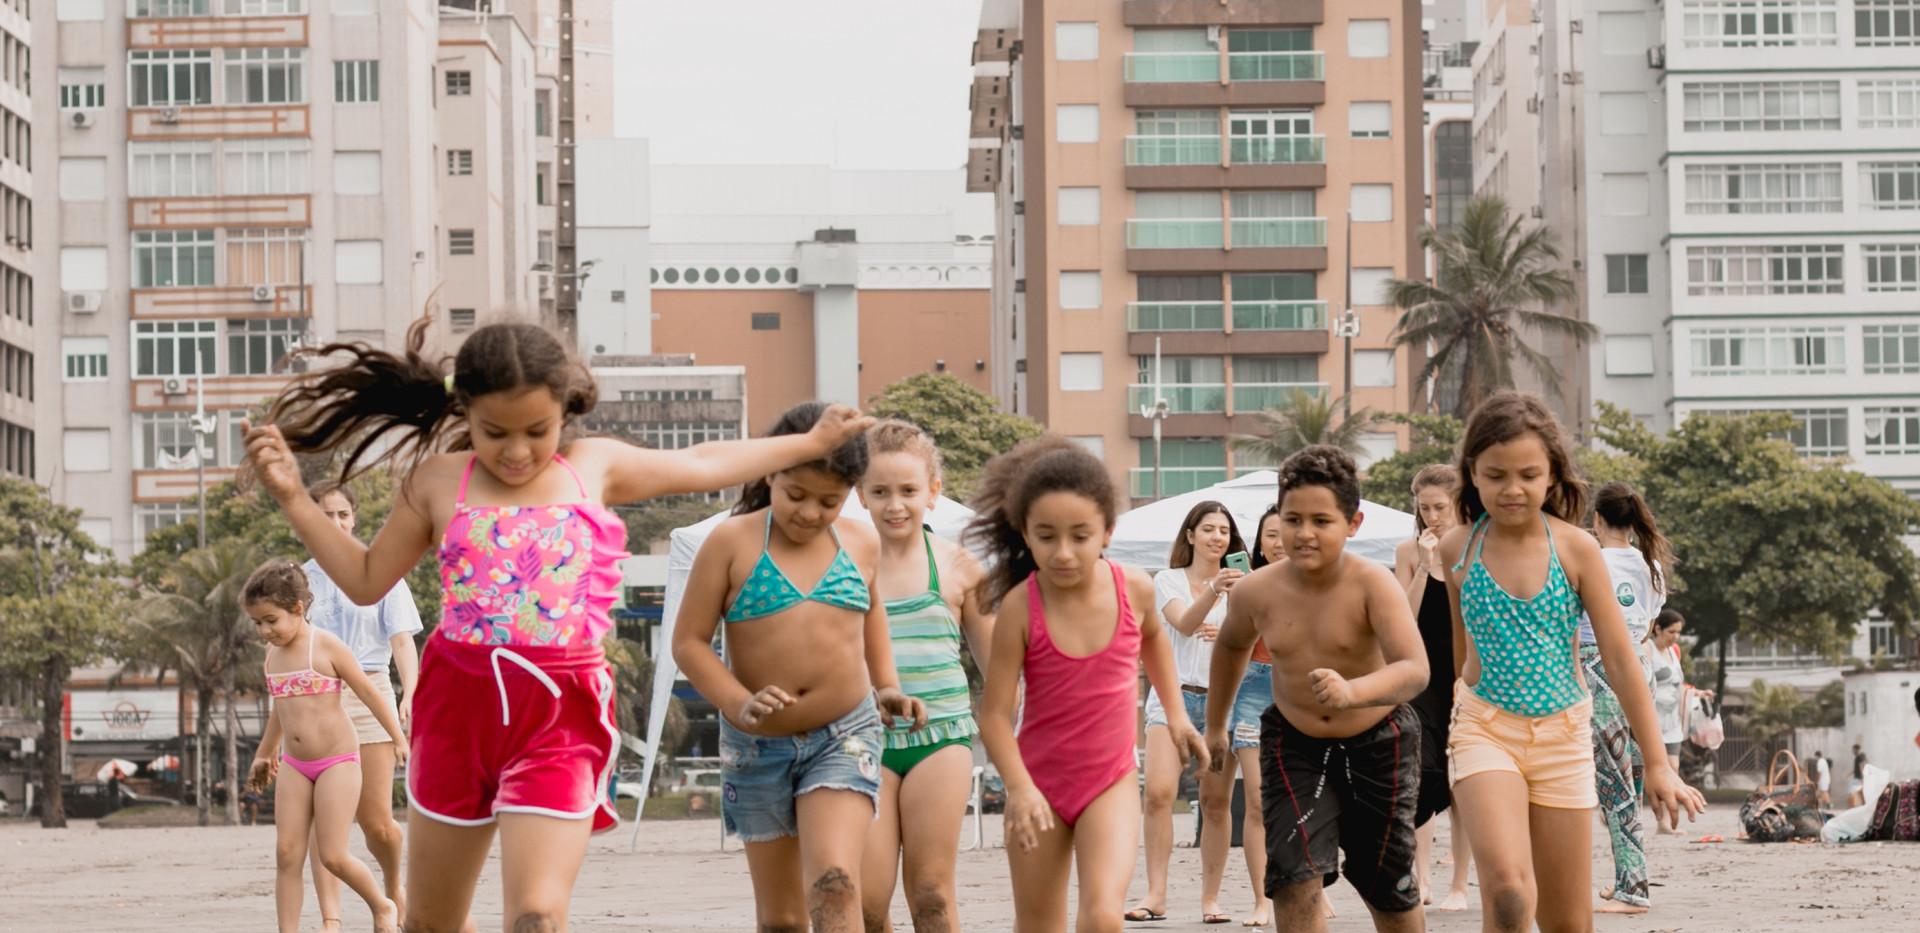 sea_made_kids-10.jpg